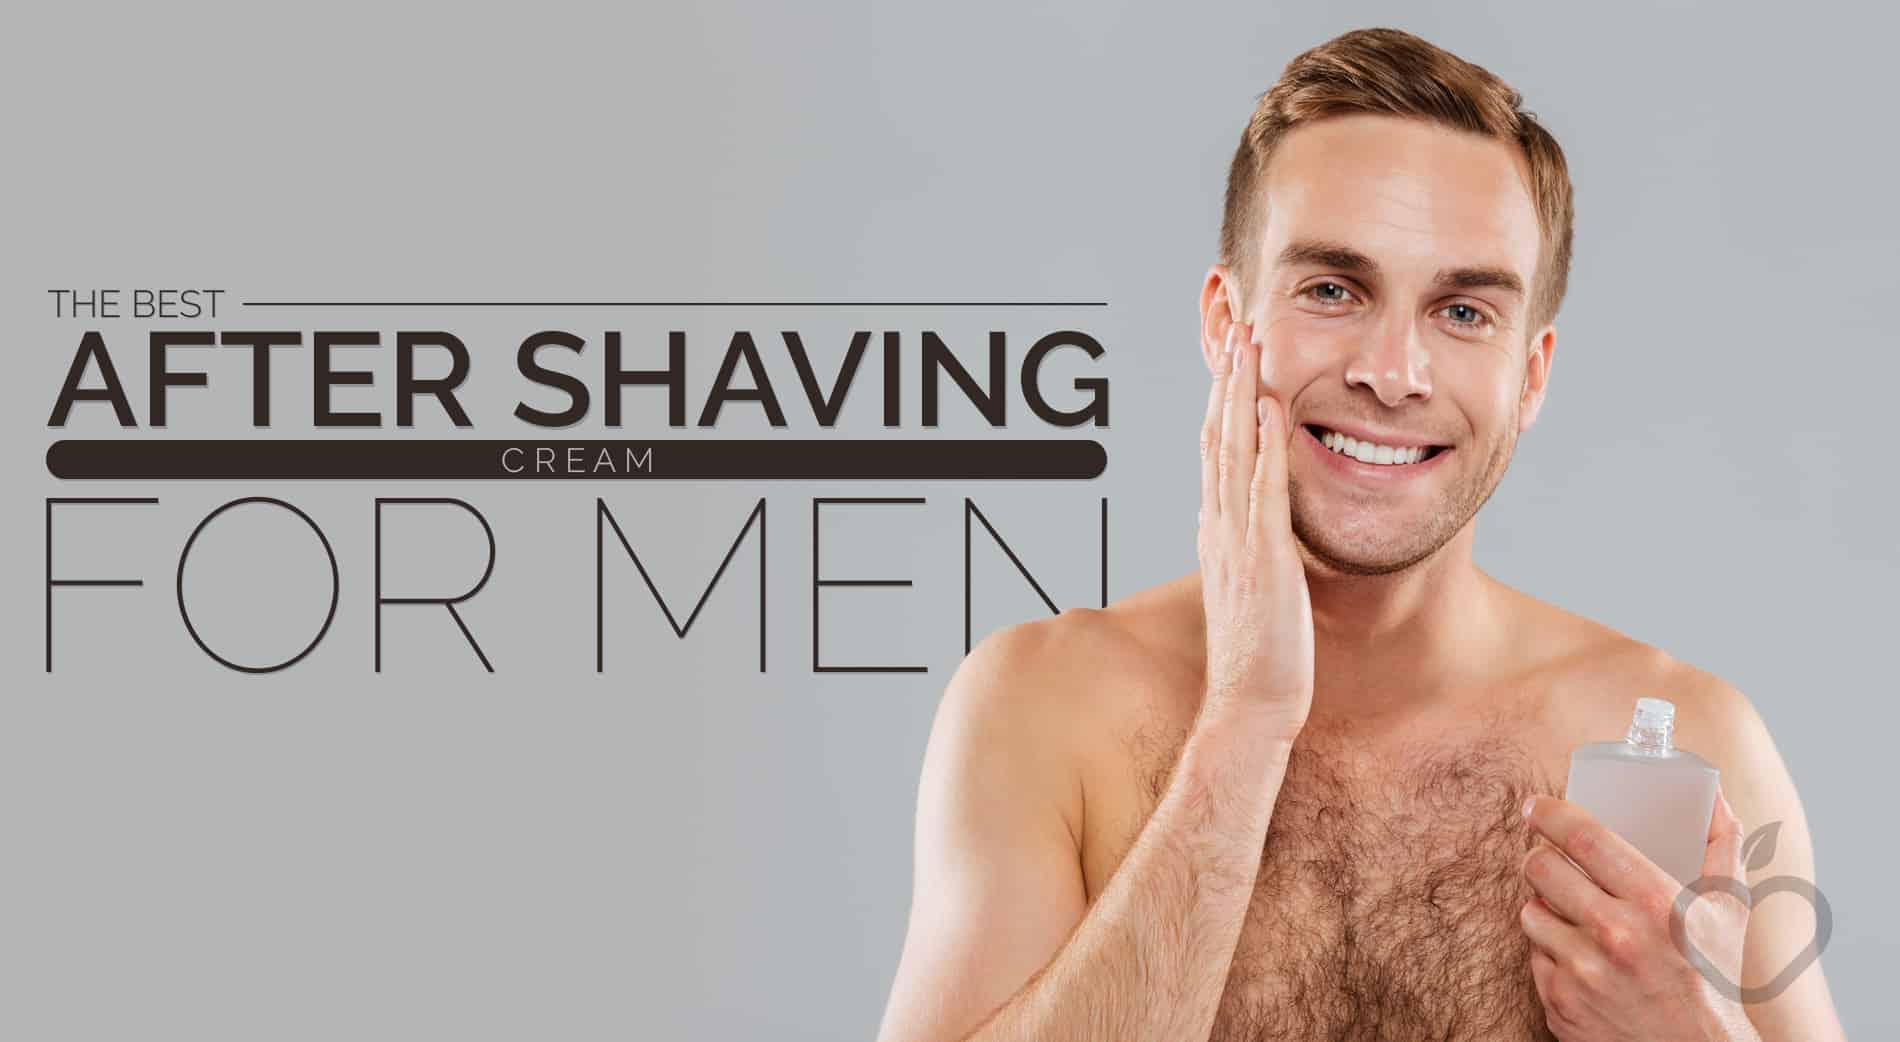 After Shaving Cream Image Design 1 - The Best After Shaving Cream for Men